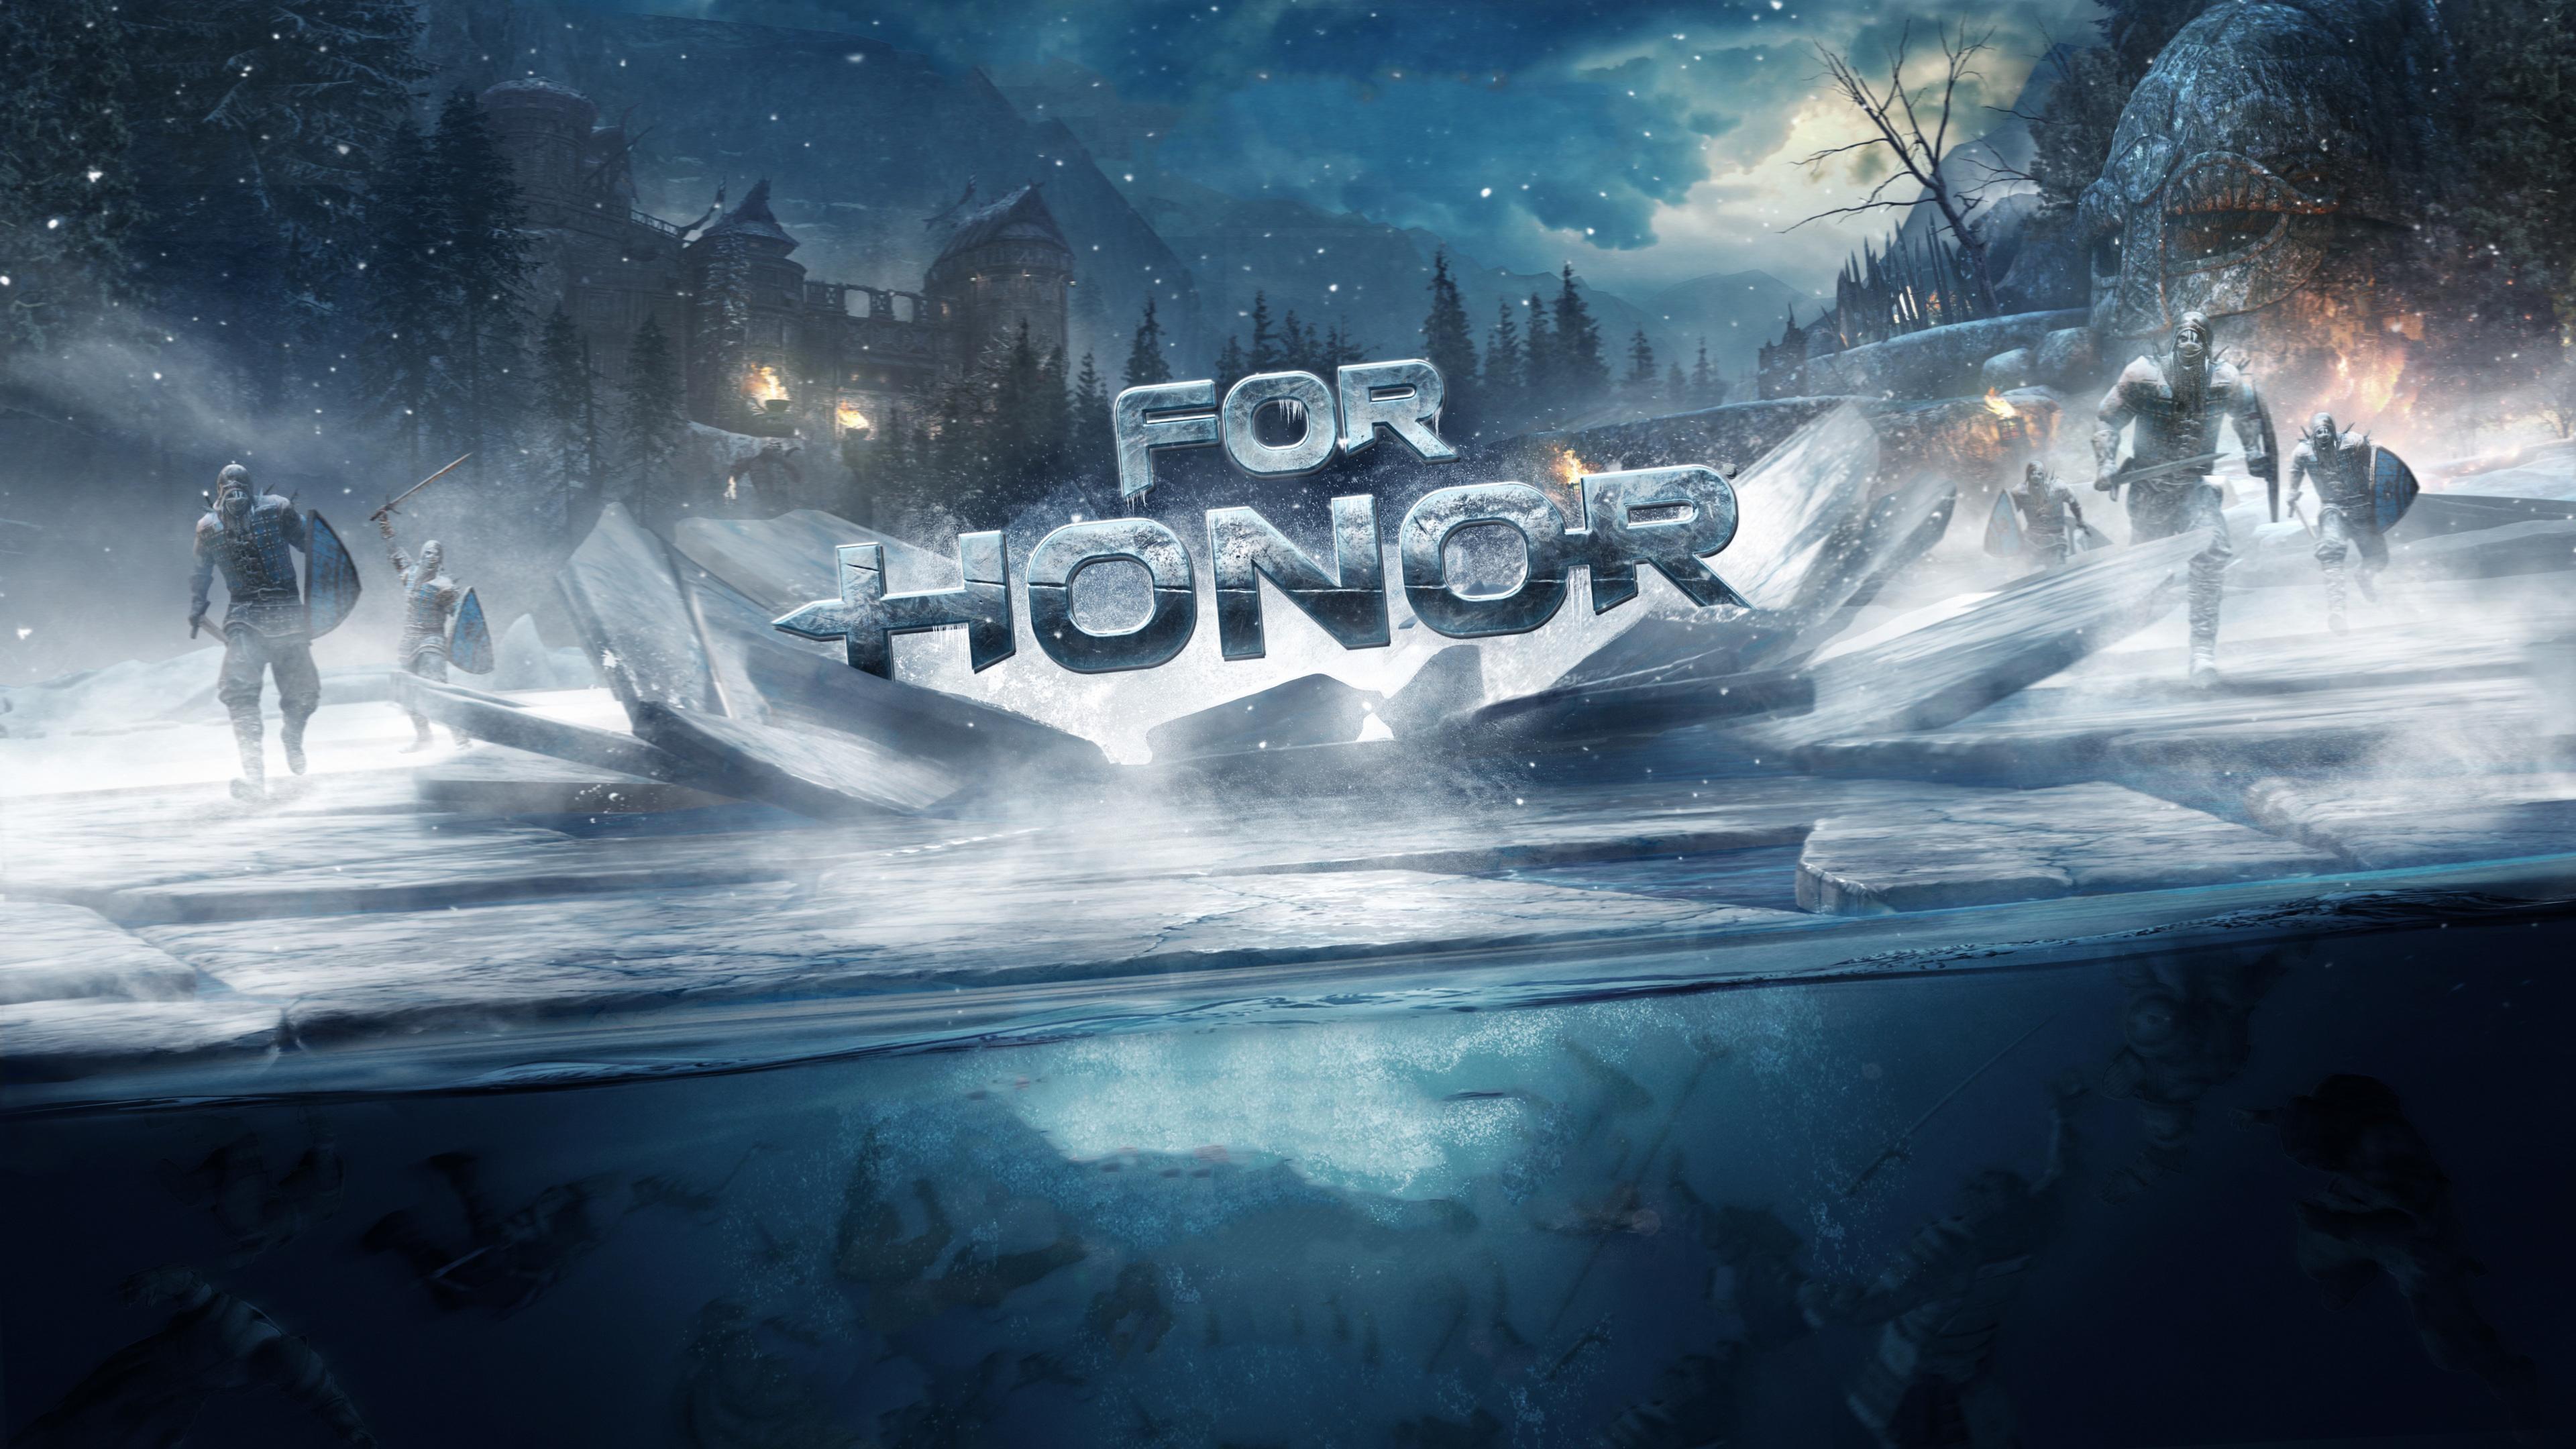 for honor frost wind 4k 1537690898 - For Honor Frost Wind 4k - xbox games wallpapers, ps games wallpapers, pc games wallpapers, hd-wallpapers, games wallpapers, for honor wallpapers, 4k-wallpapers, 2018 games wallpapers